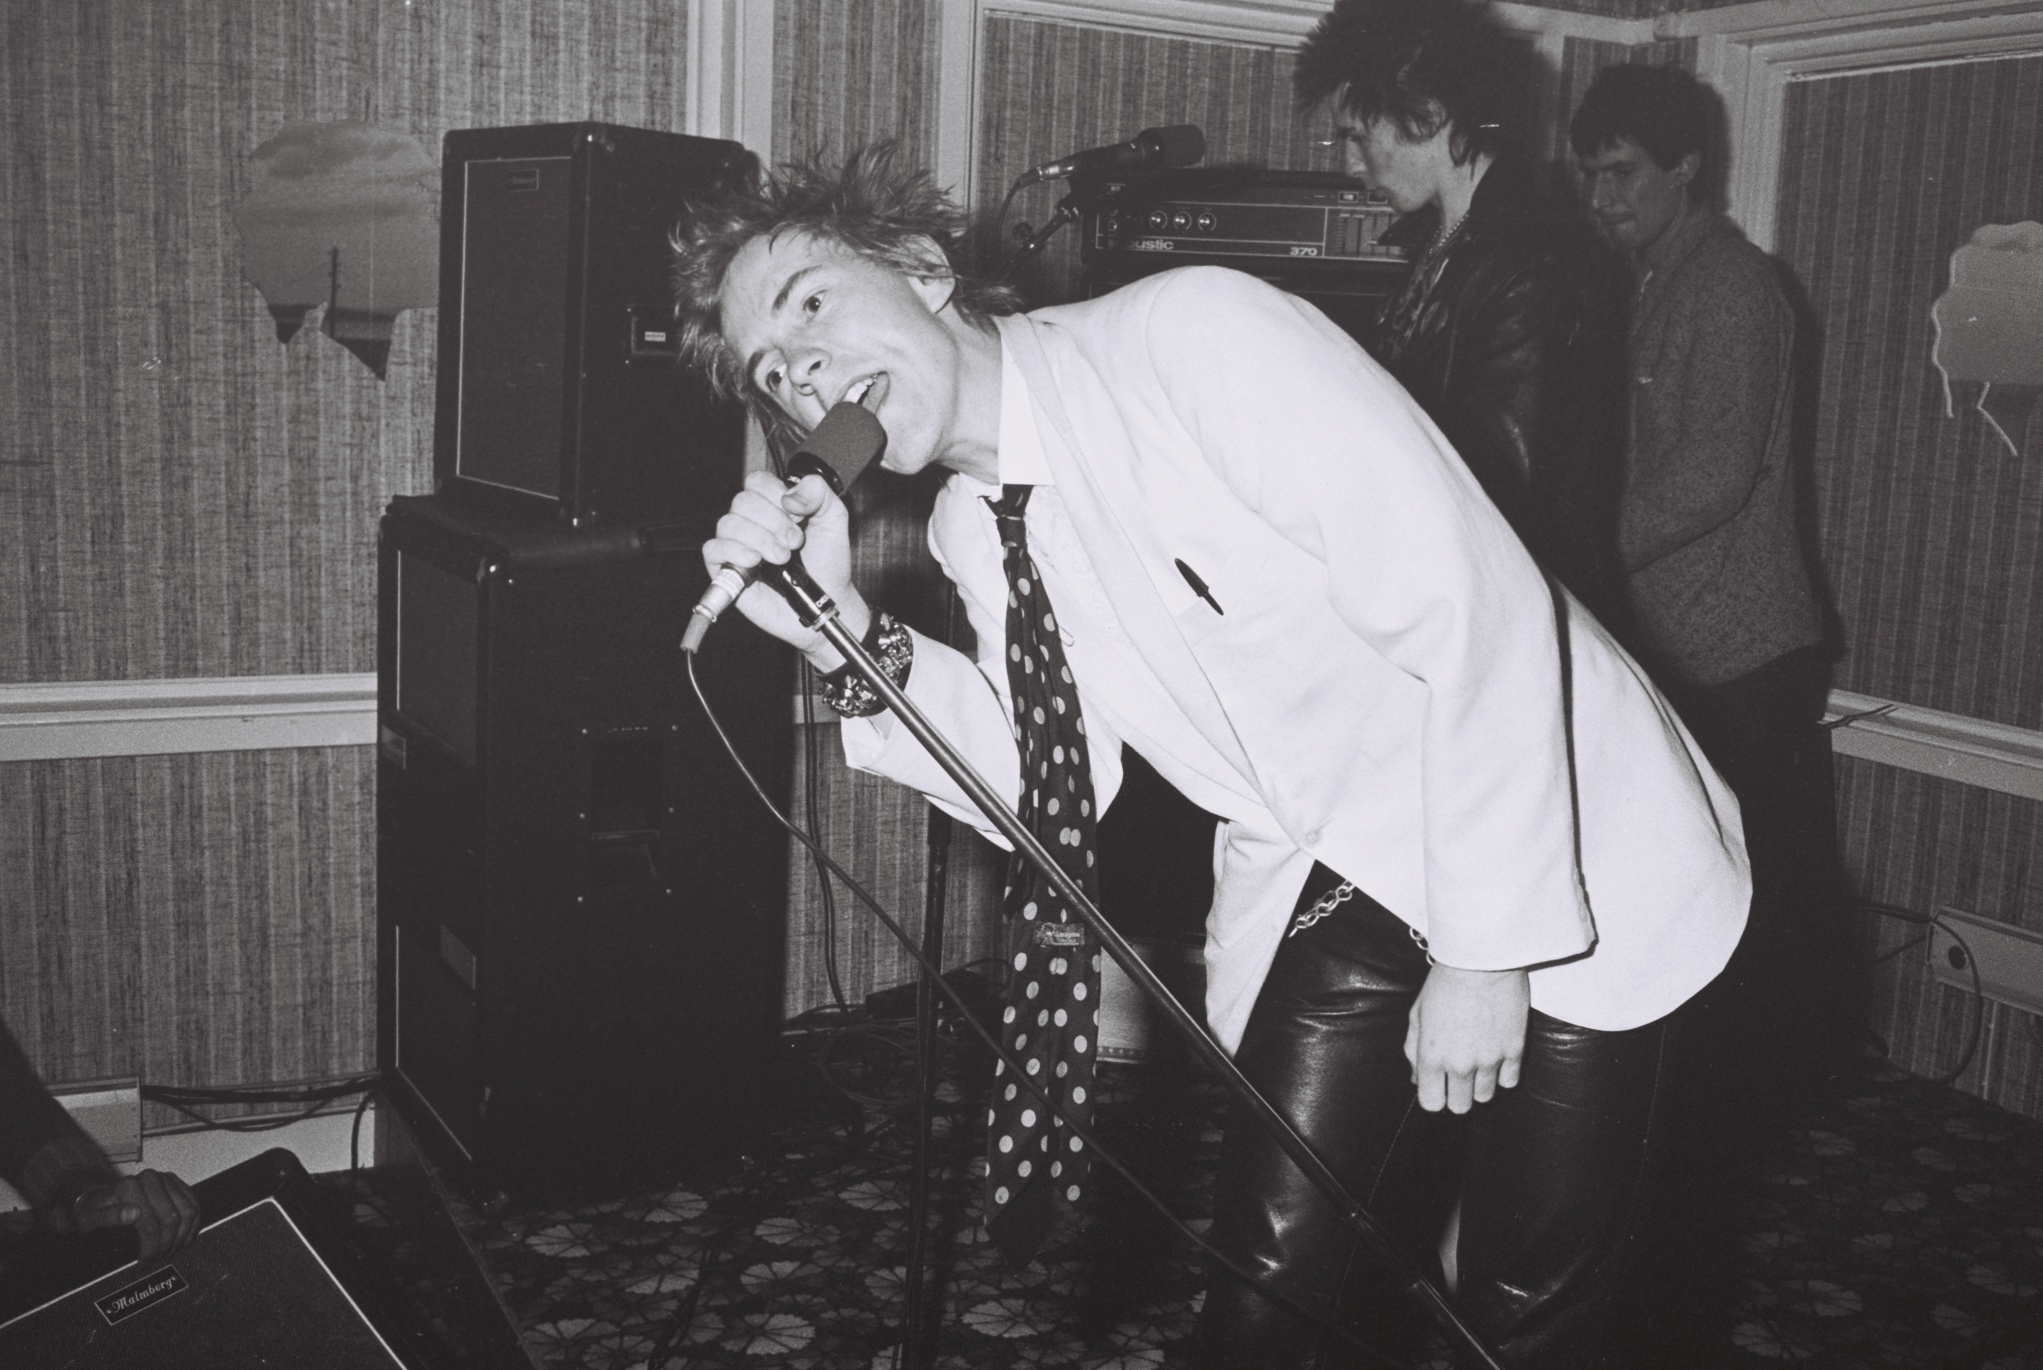 Lars_Astrom_Sex_Pistols_Halmstad_1977_KoB_LAs_1